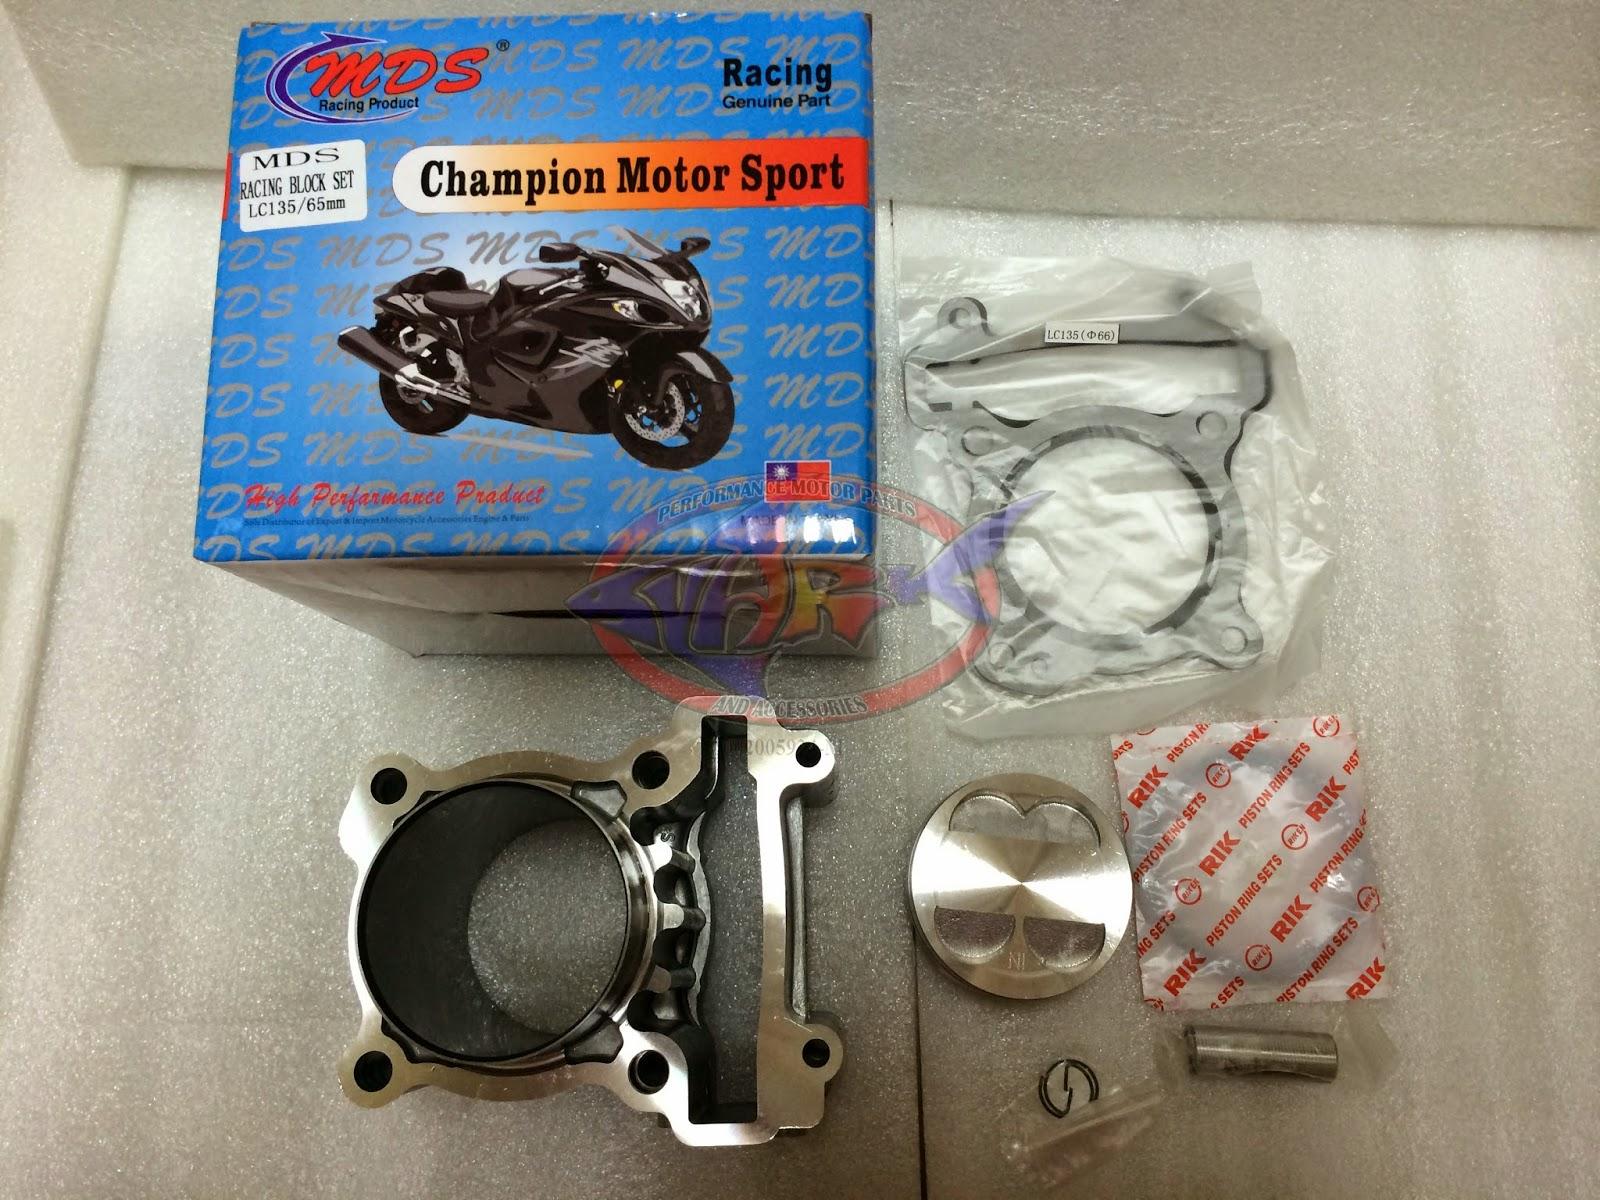 Syark Performance Motor Parts & Accessories Online Shop (V2